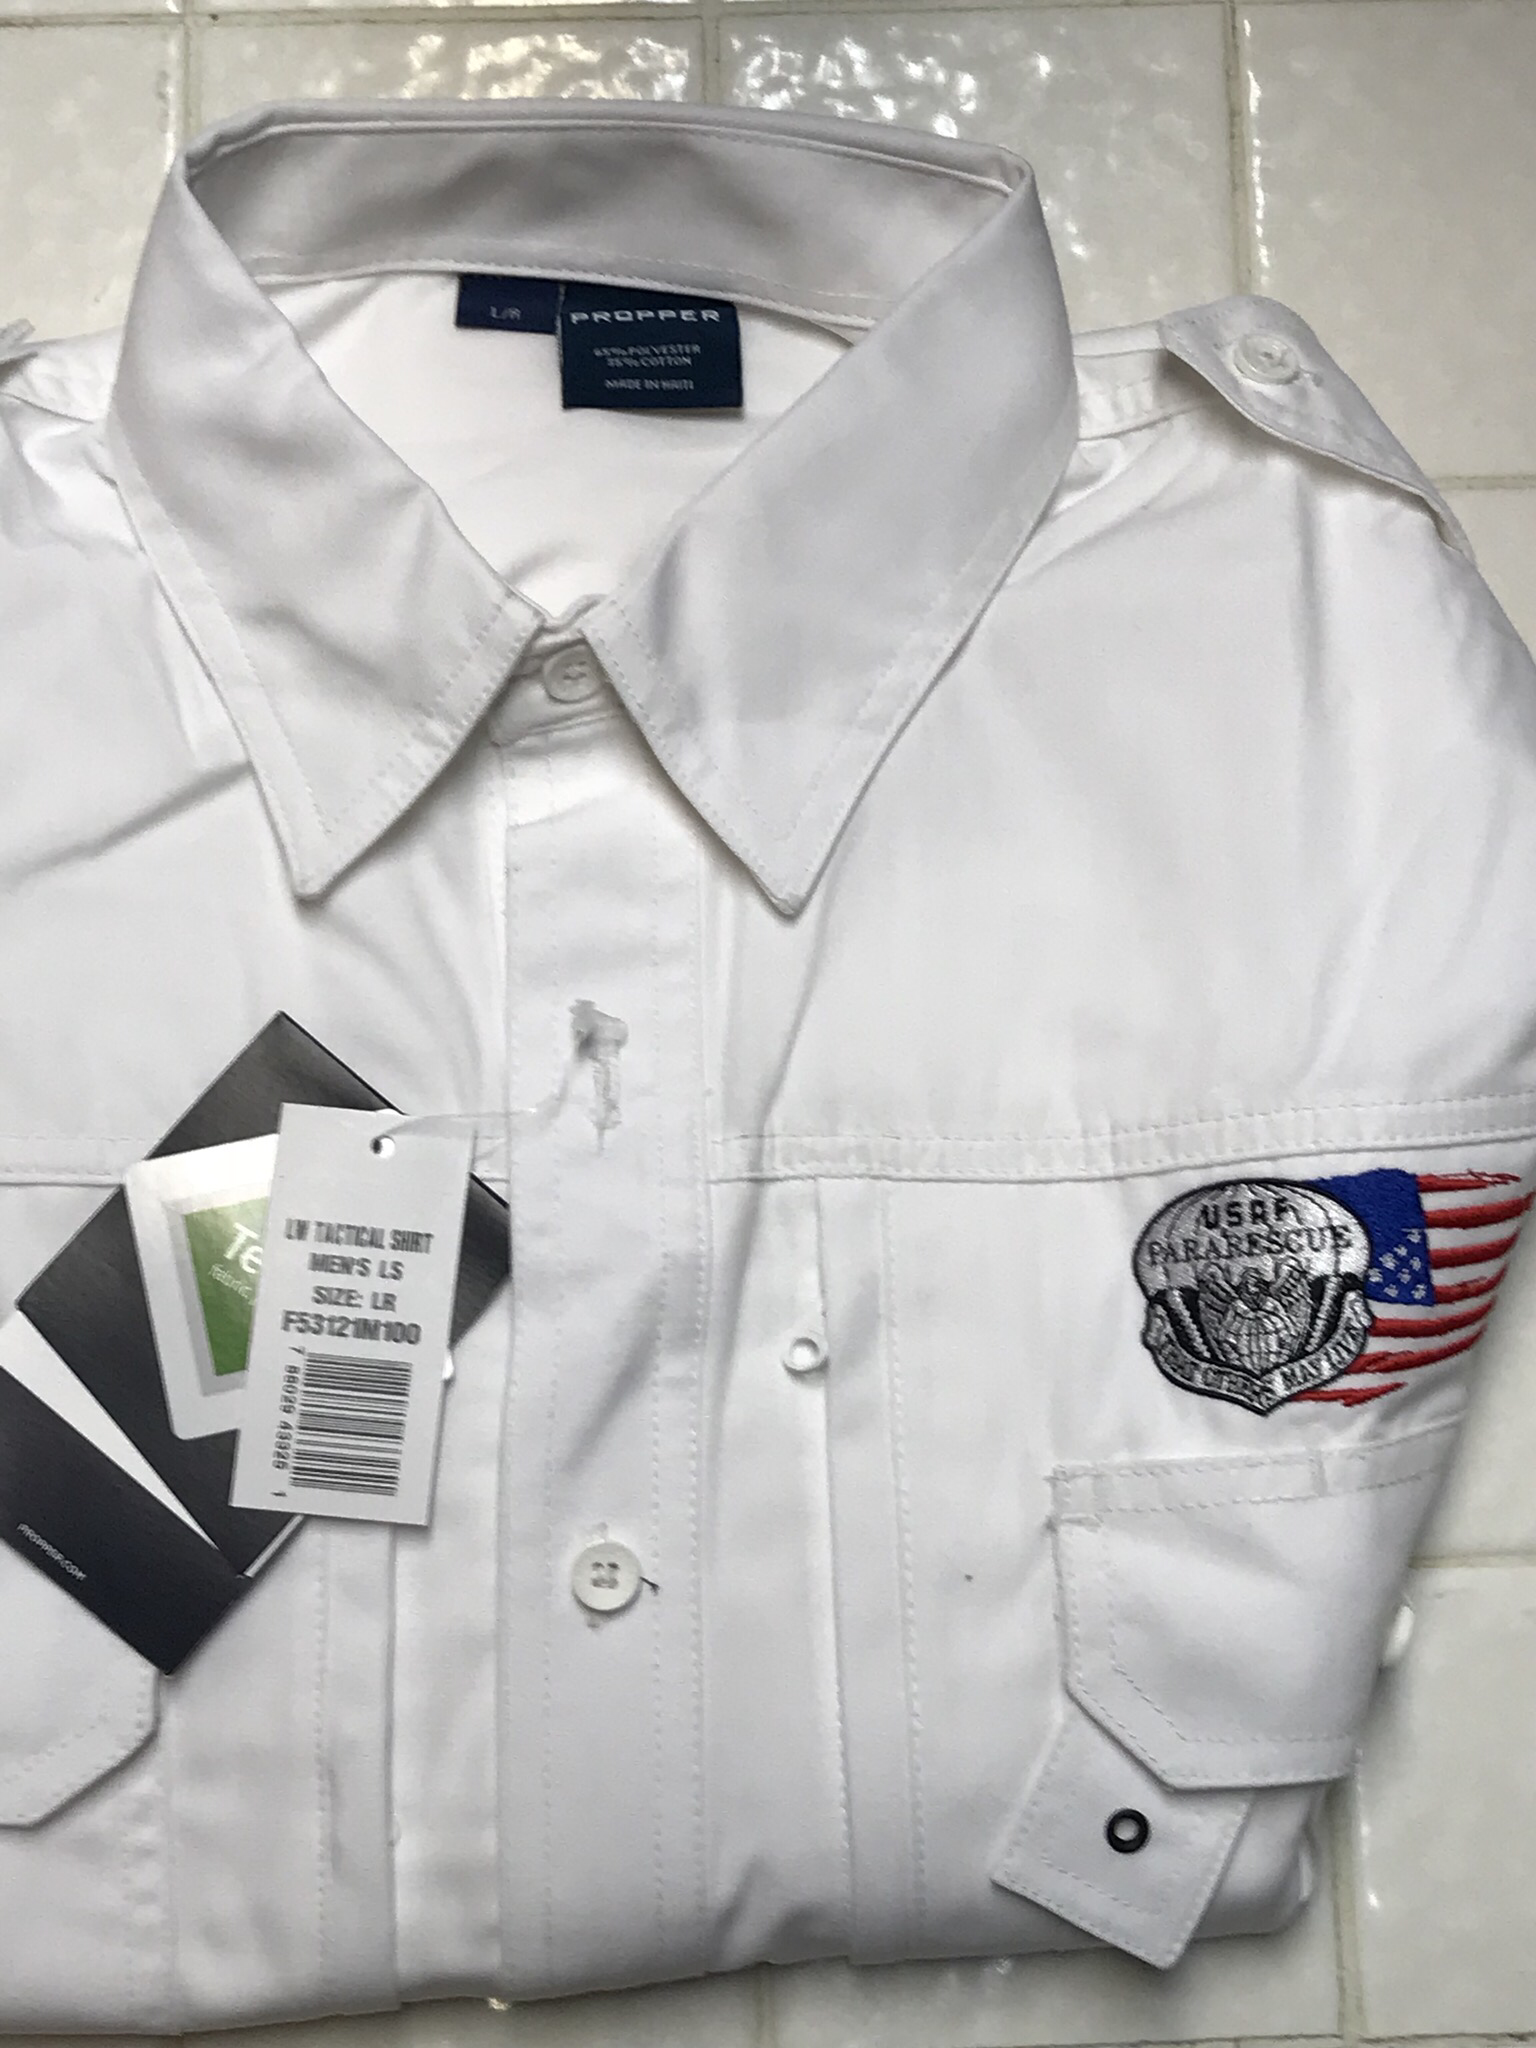 pja/ PJ Flash & Tattered Flag Long Sleeve Tactical Shirt/Large 01-0044